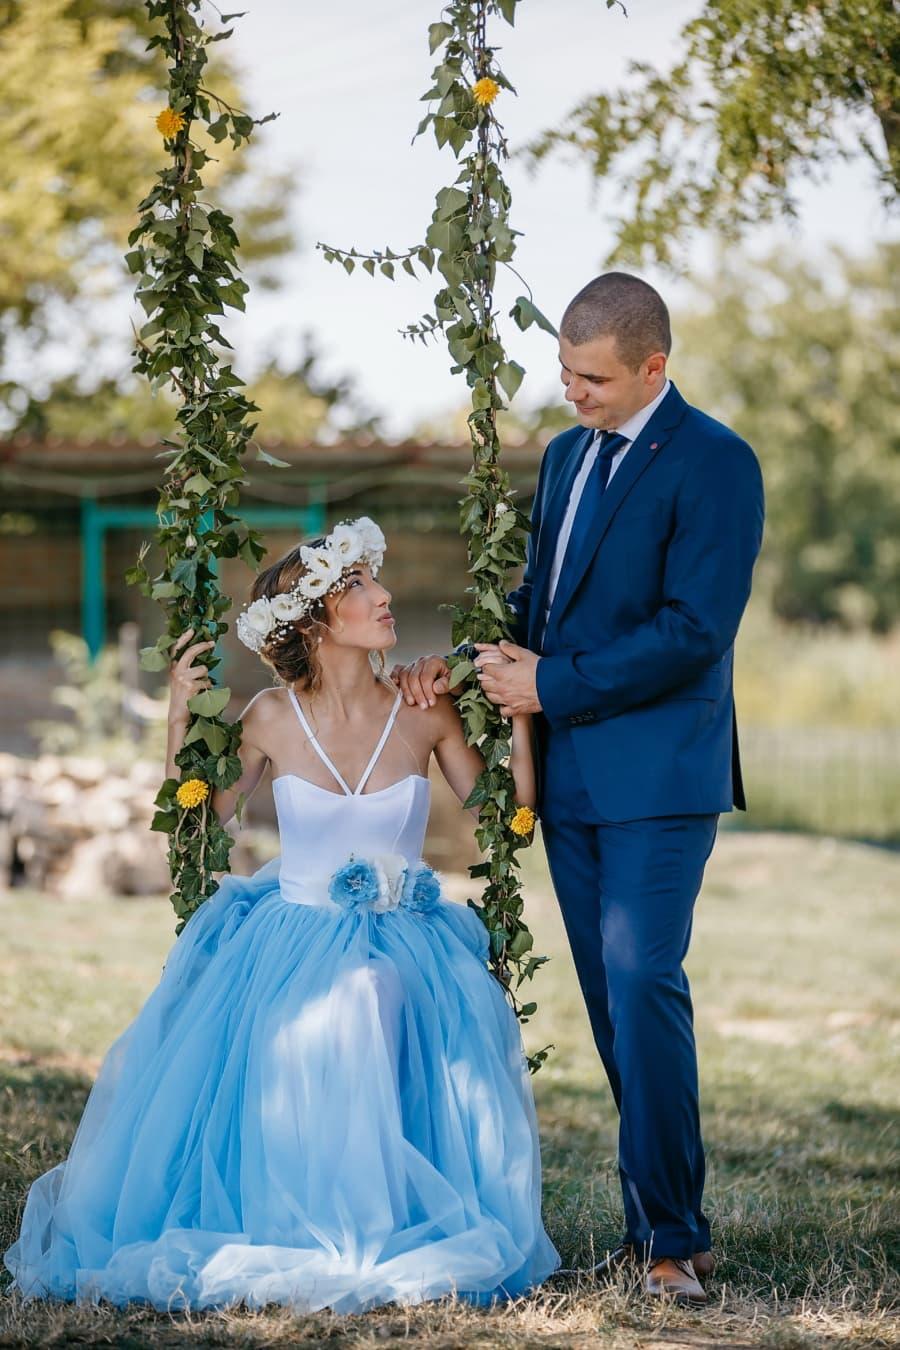 newlyweds, countryside, swing, fashion, bride, dress, groom, marriage, wedding, love